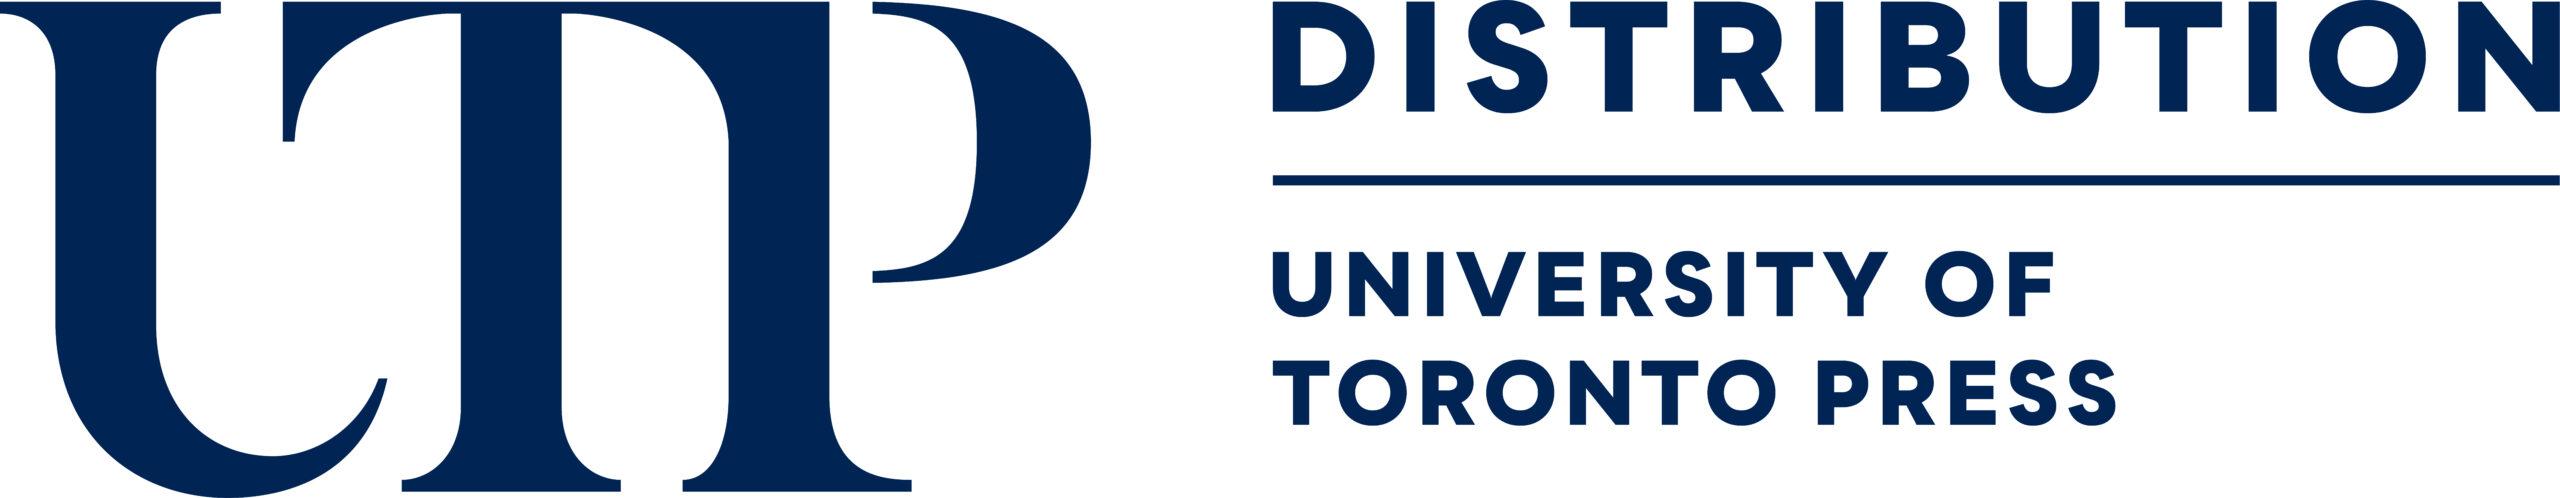 University of Toronto Press Distribution